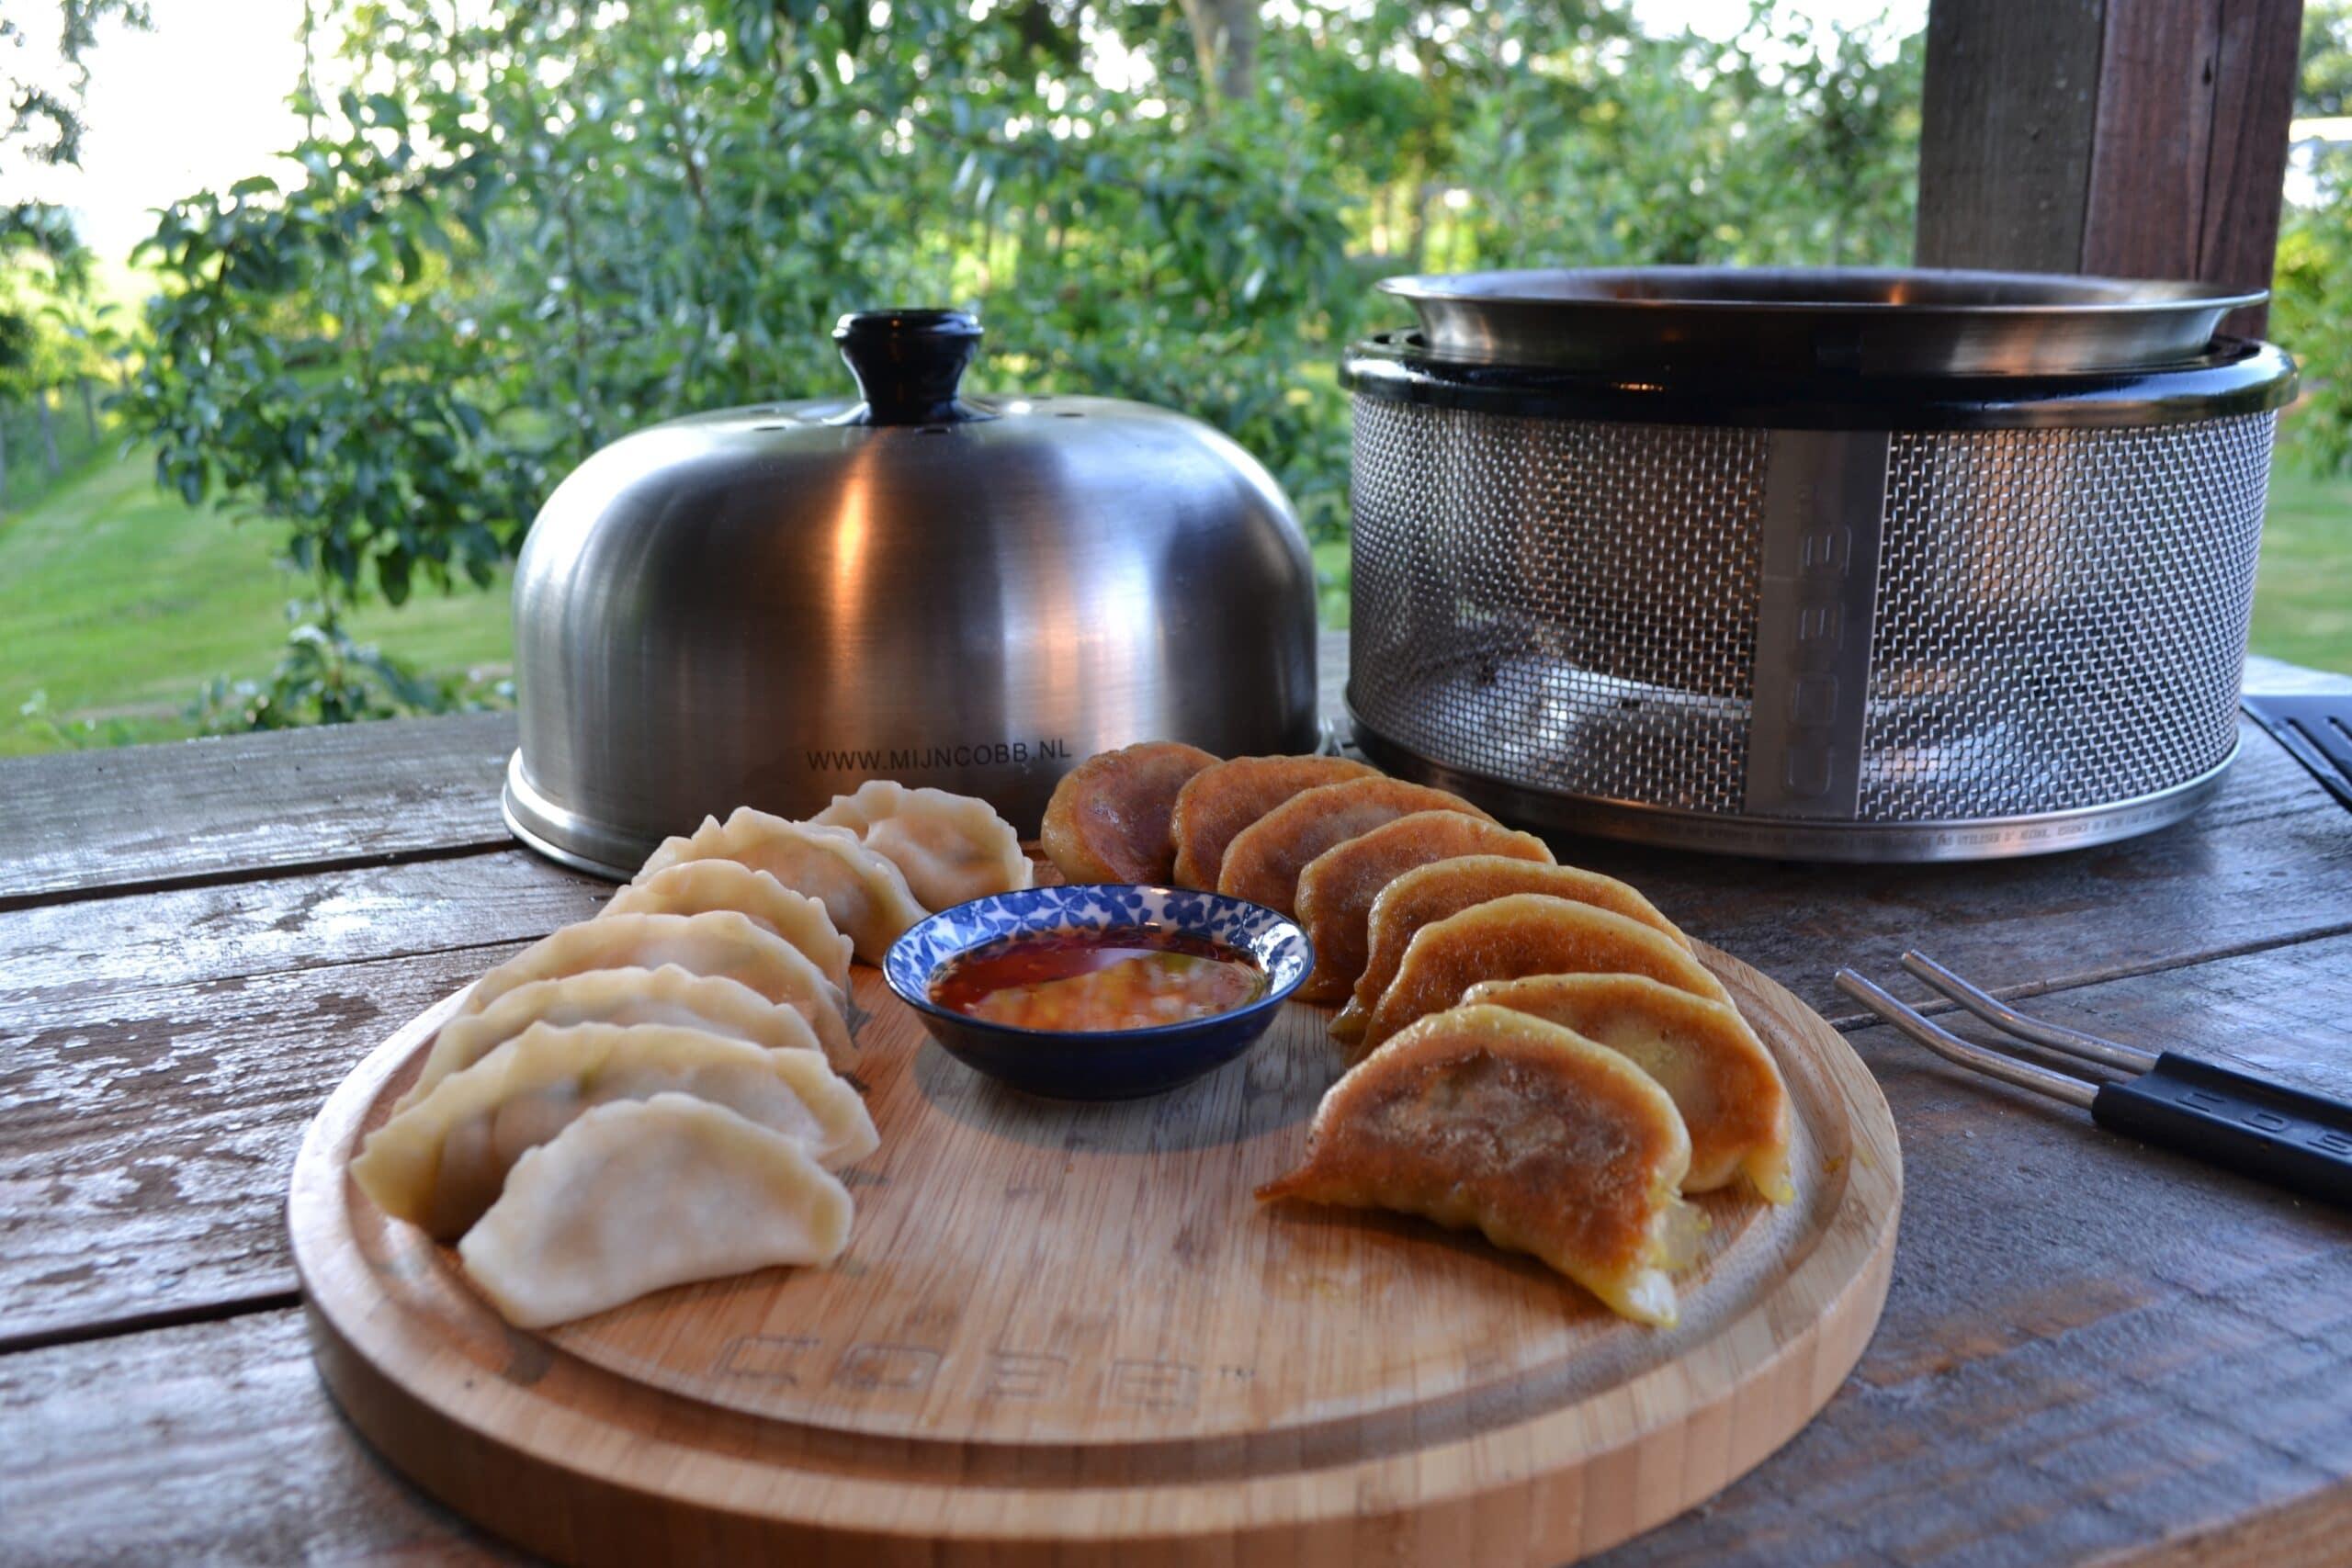 BBQ Inspiratie Dumplings COBB 16